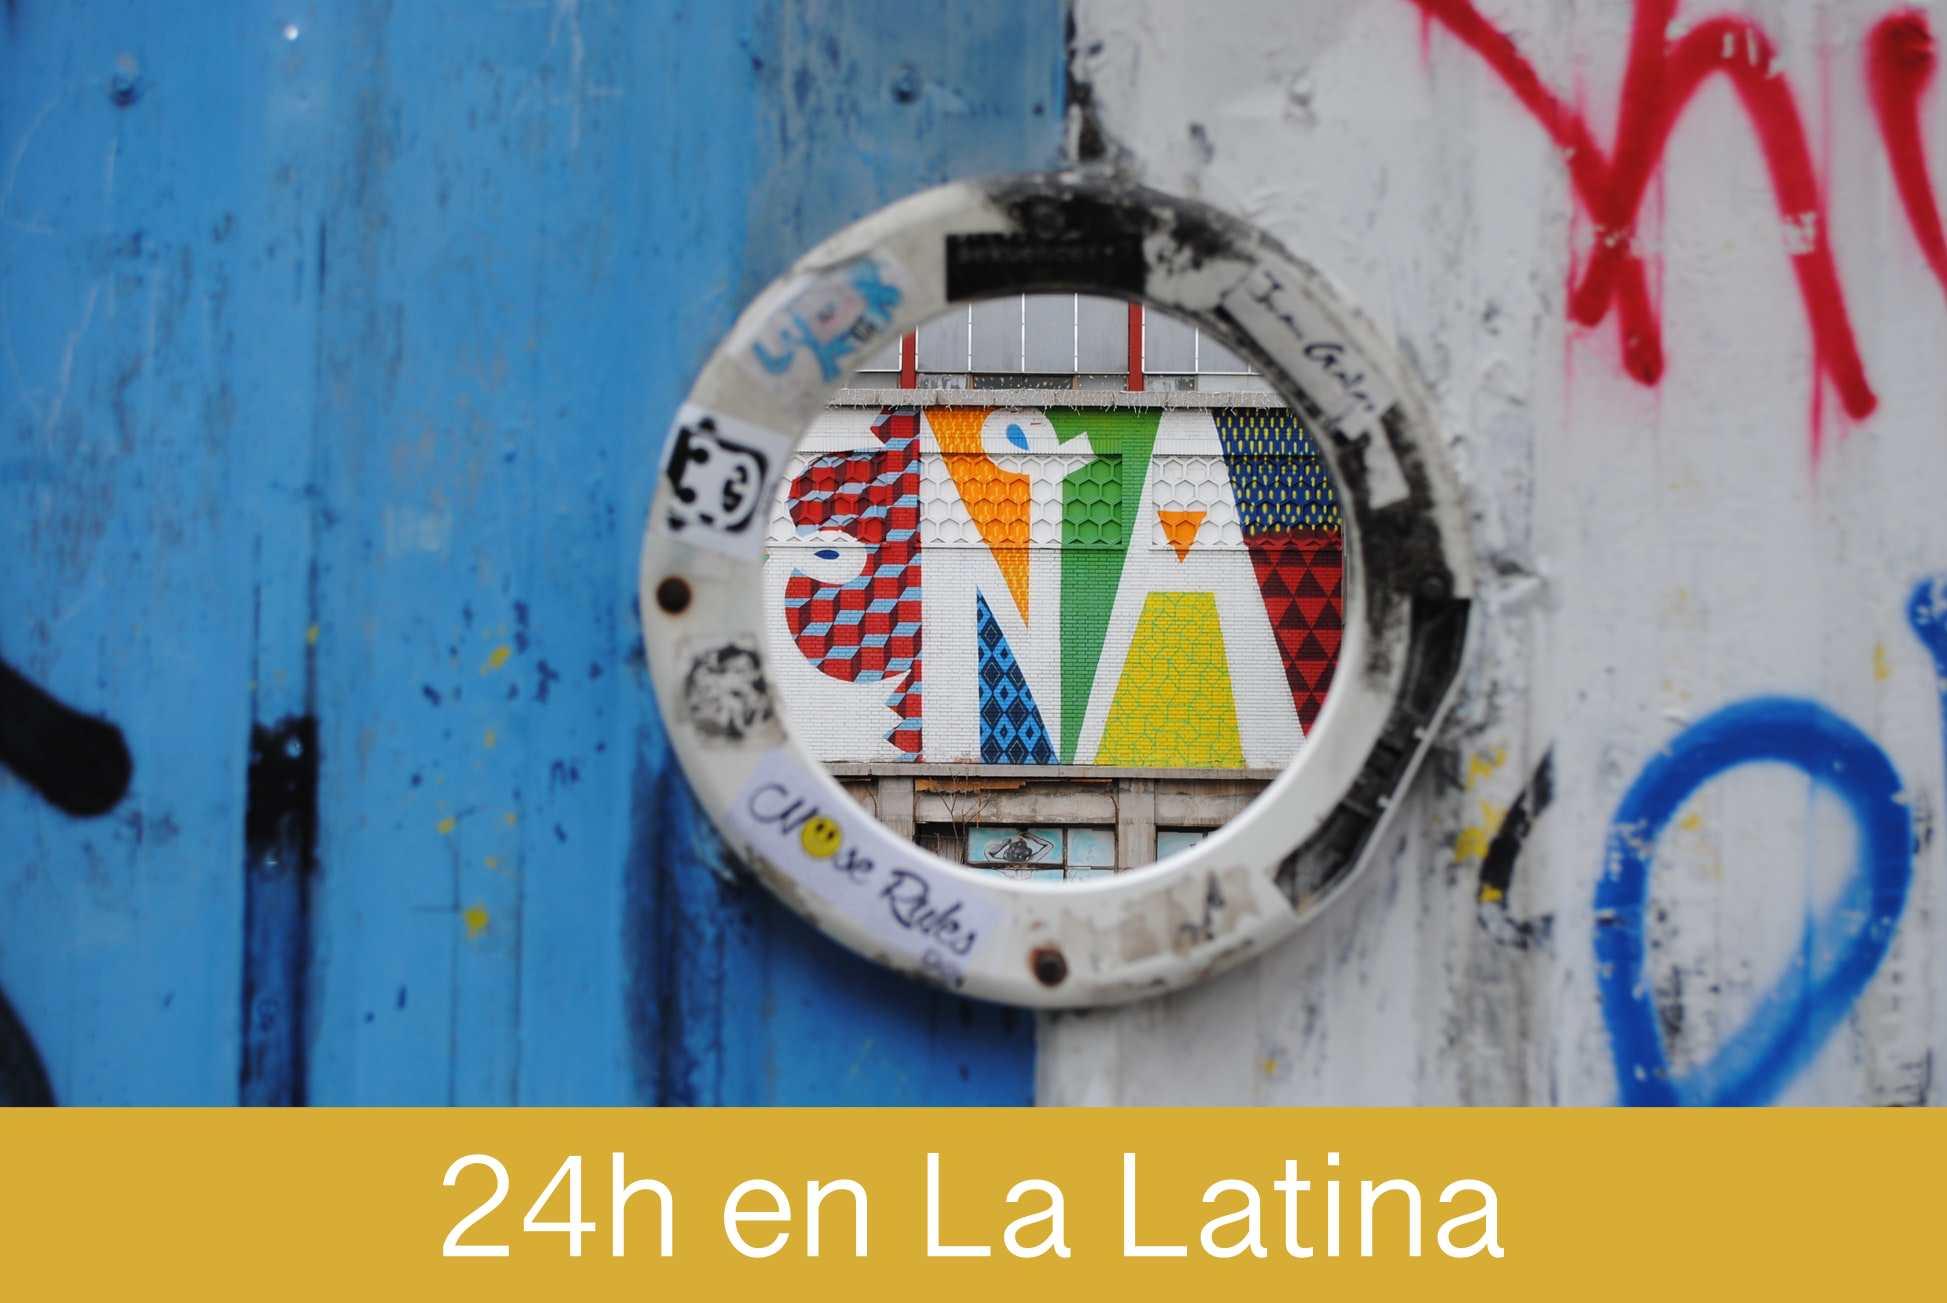 24h en La Latina